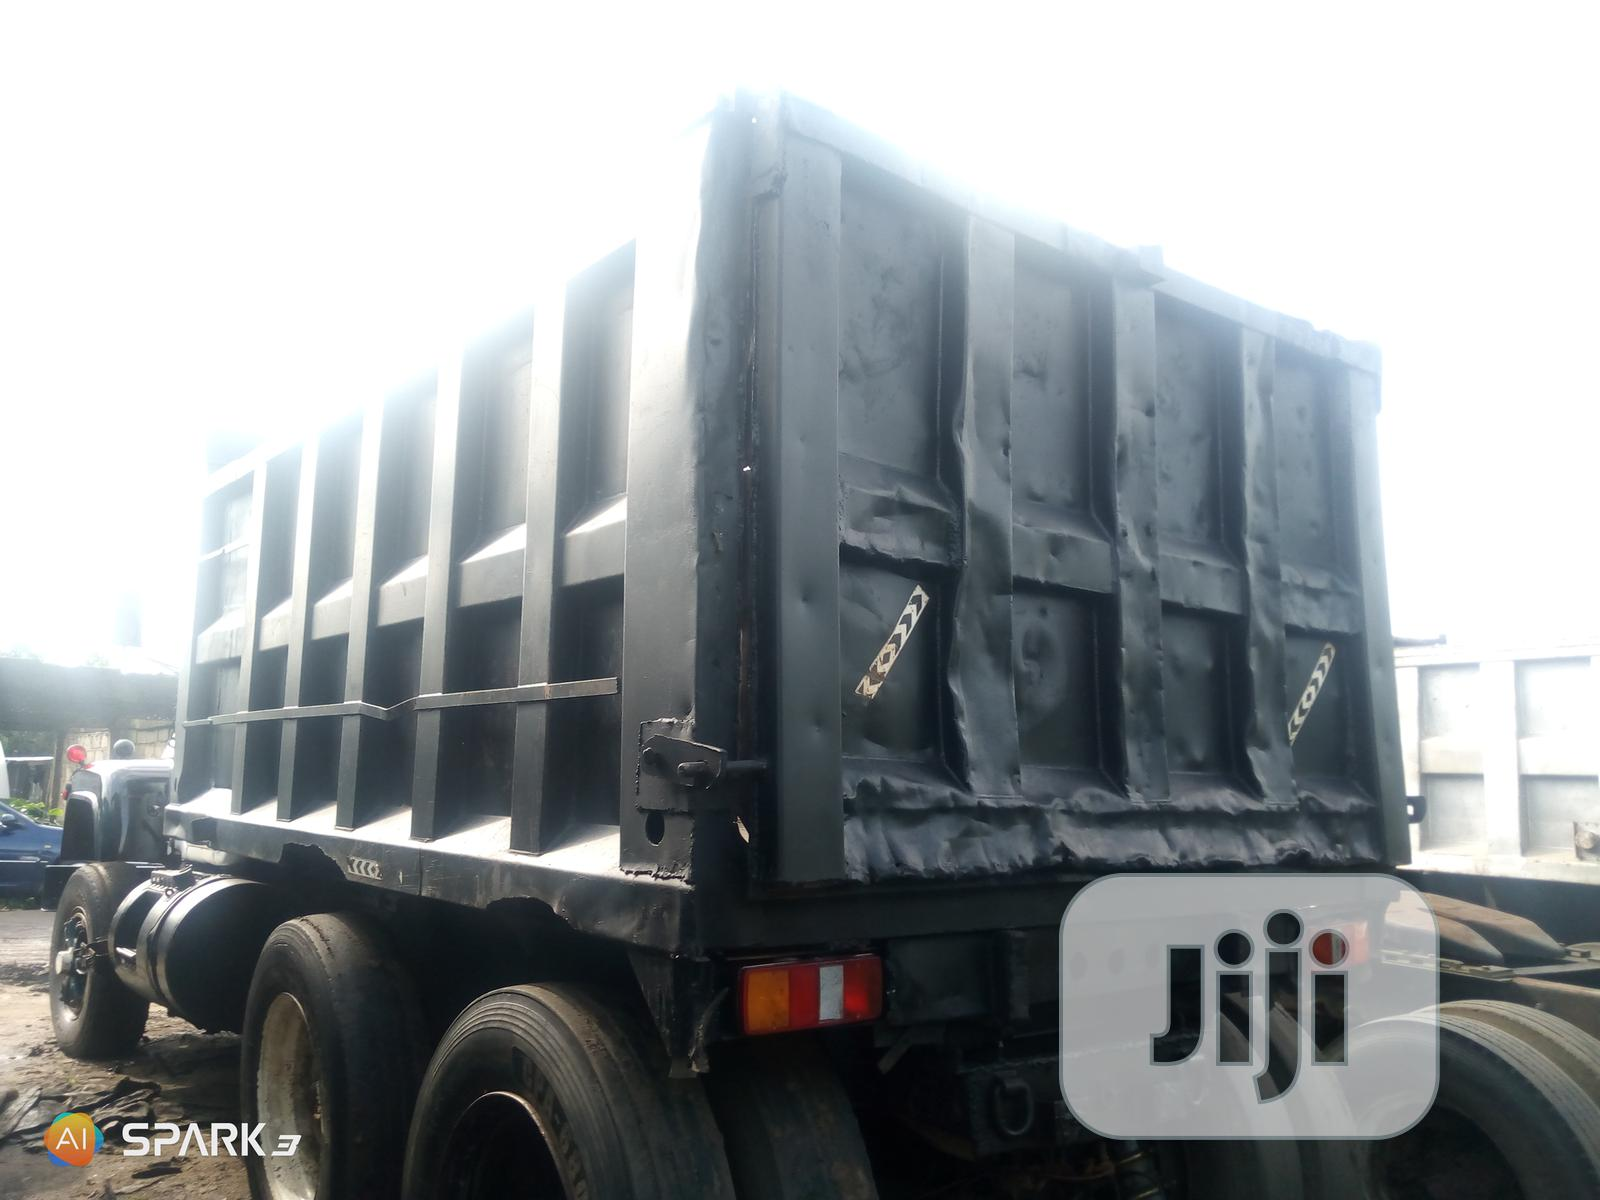 Mack R Model 2013 White | Trucks & Trailers for sale in Aba South, Abia State, Nigeria